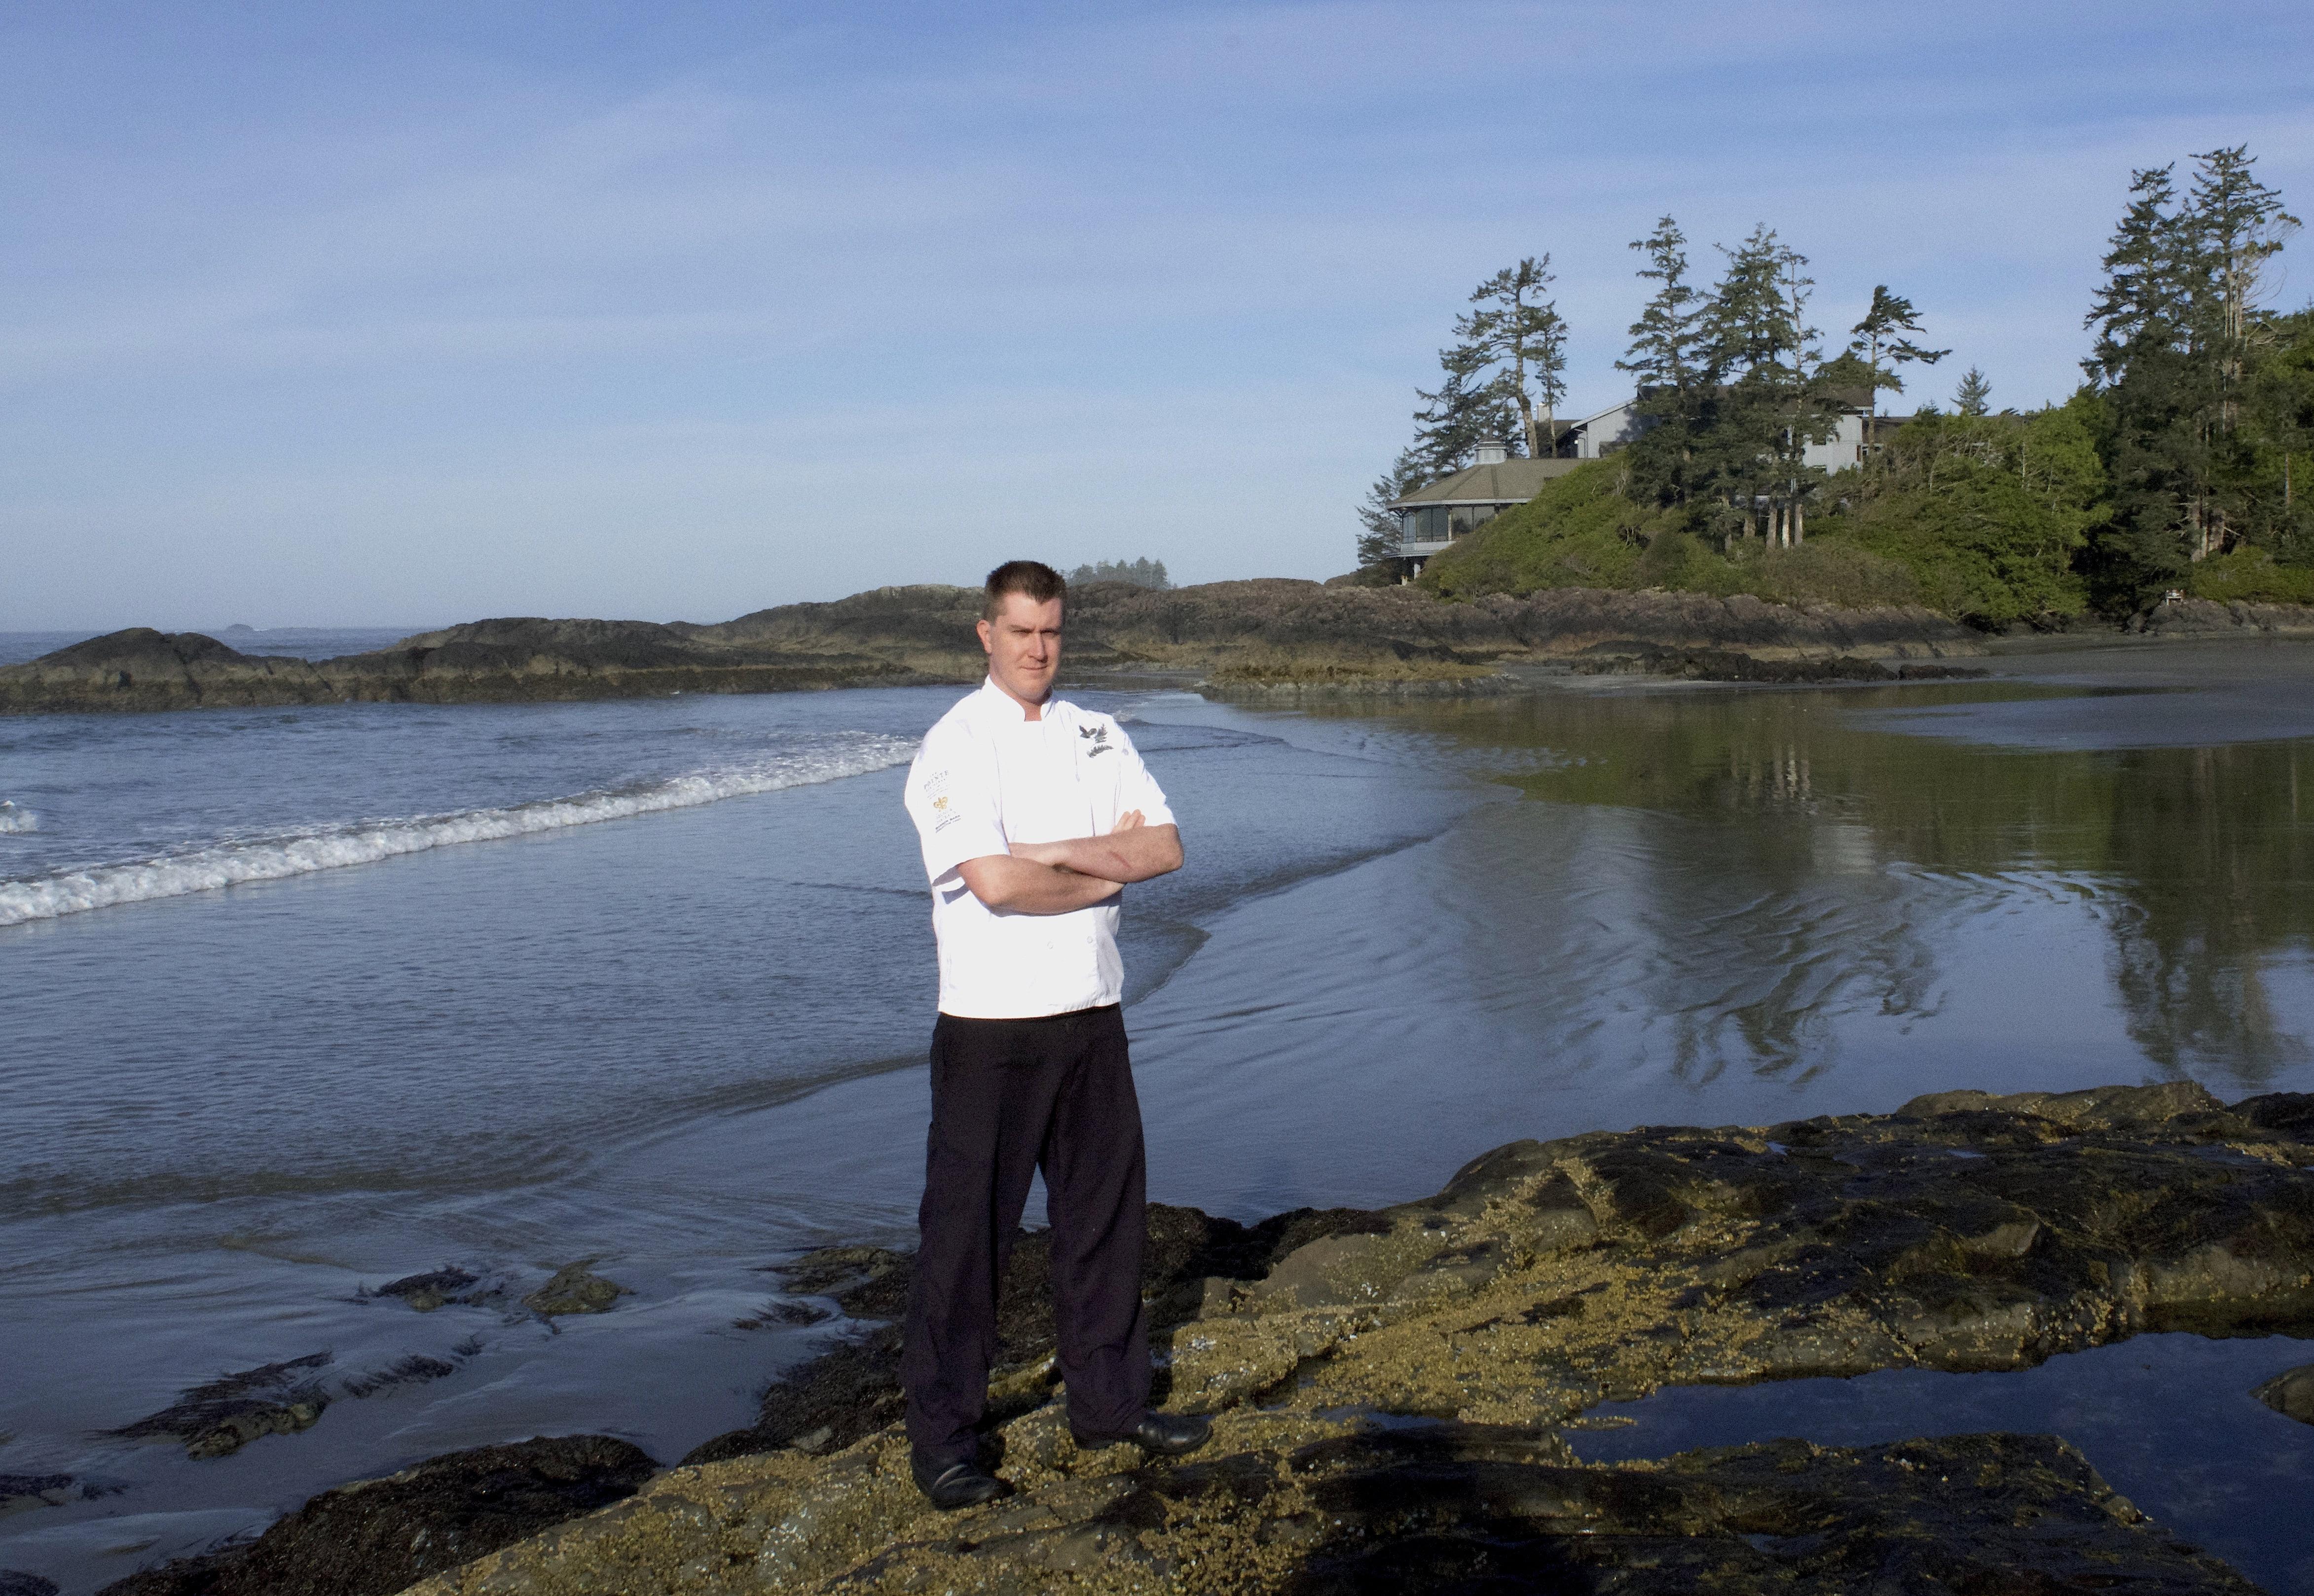 The pointe restaurant wickaninnish inn tofino canada - Chef Warren Barr In Front Of The Pointe